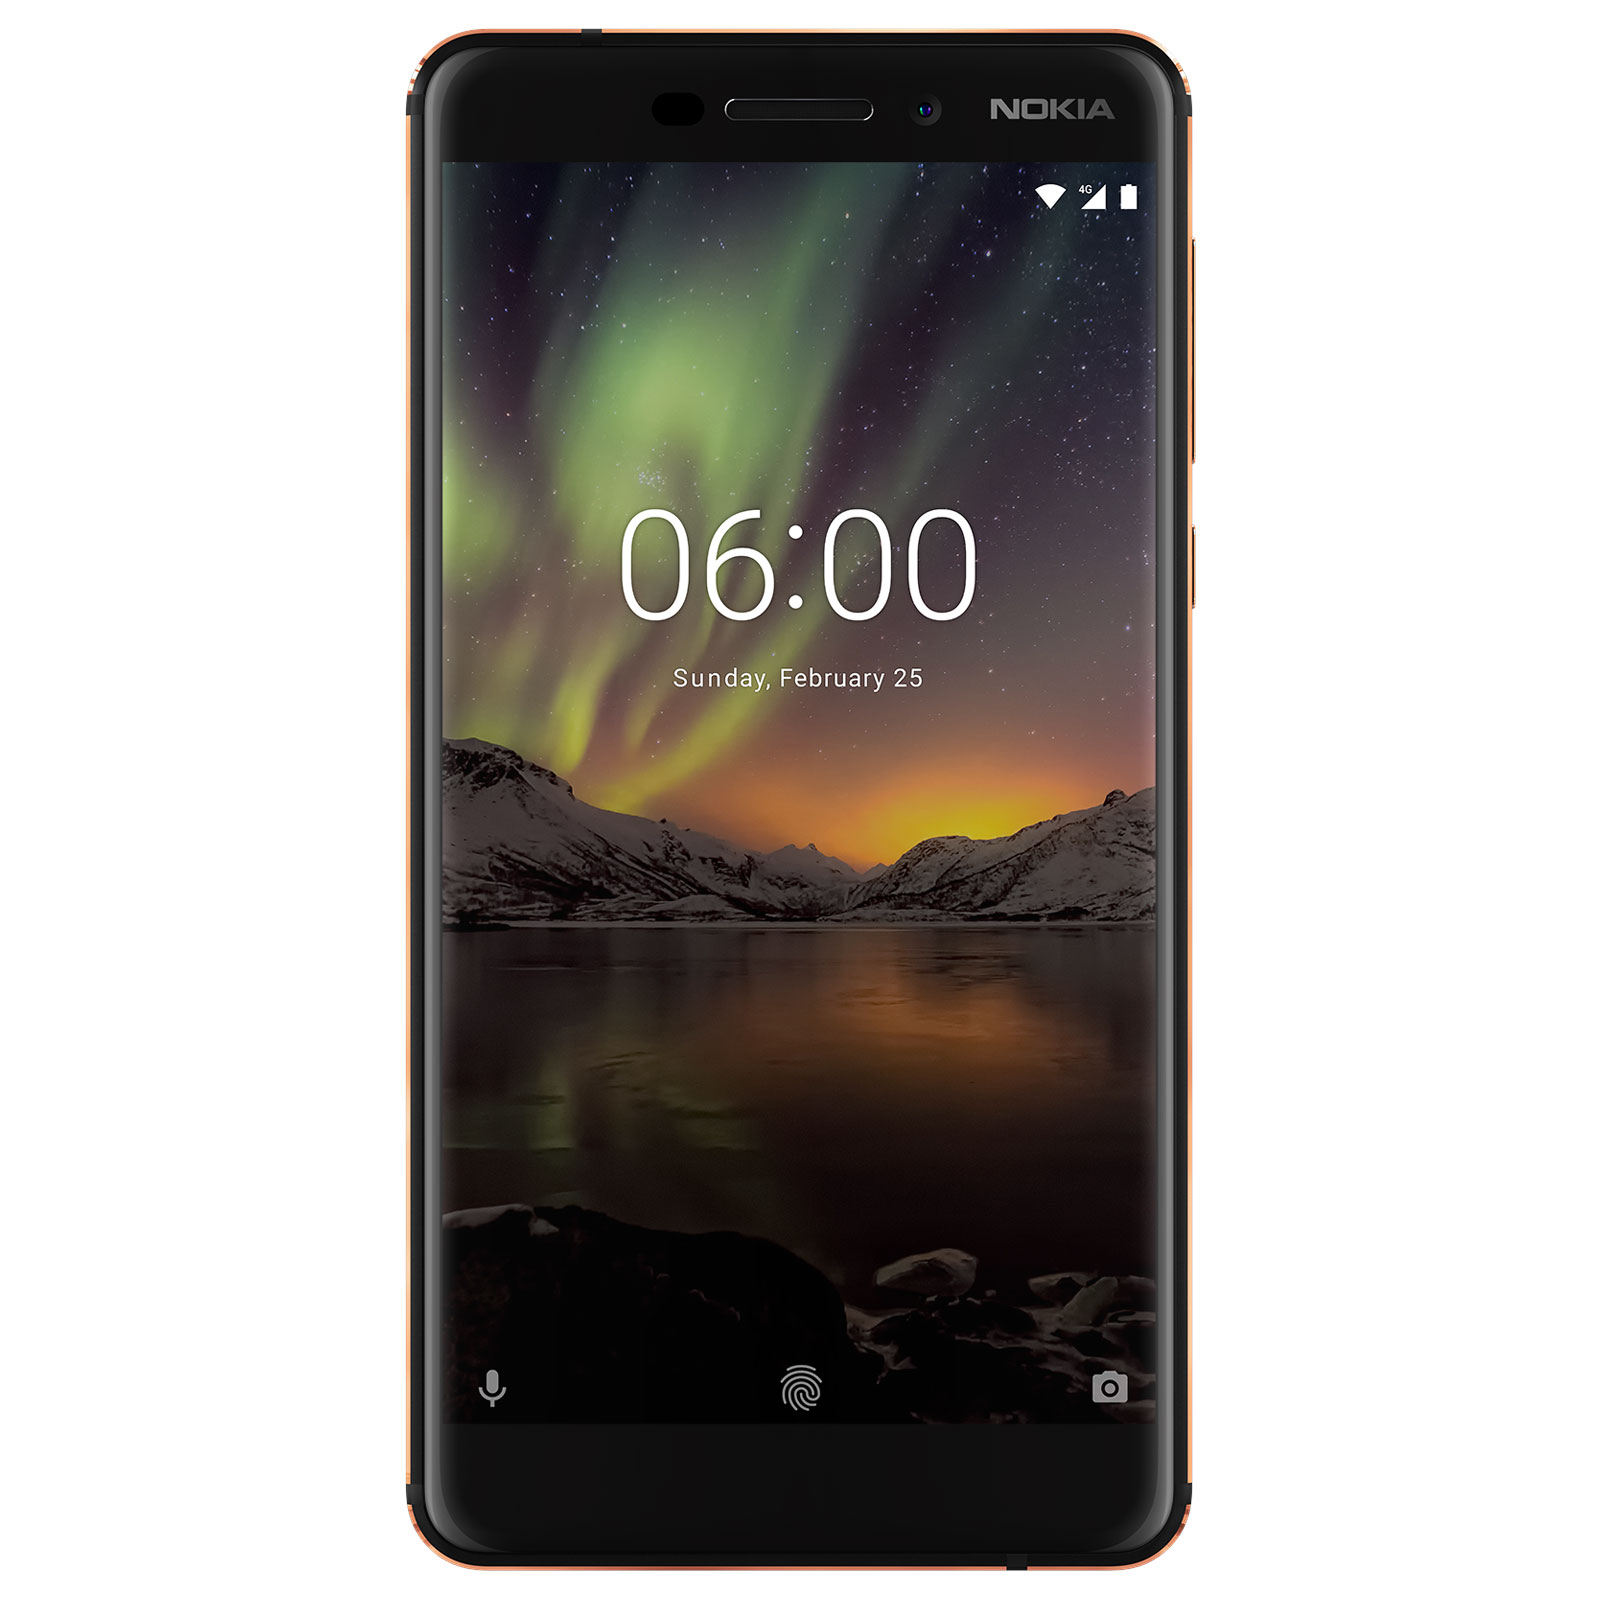 "Mobile & smartphone Nokia 6.1 Noir Smartphone 4G-LTE Dual SIM - Snapdragon 630 8-core 2.2 GHz - RAM 3 Go - Ecran tactile 5.5"" 1080 x 1920 - 32 Go - NFC/Bluetooth 5.0 - 3000 mAh - Android 8.0"